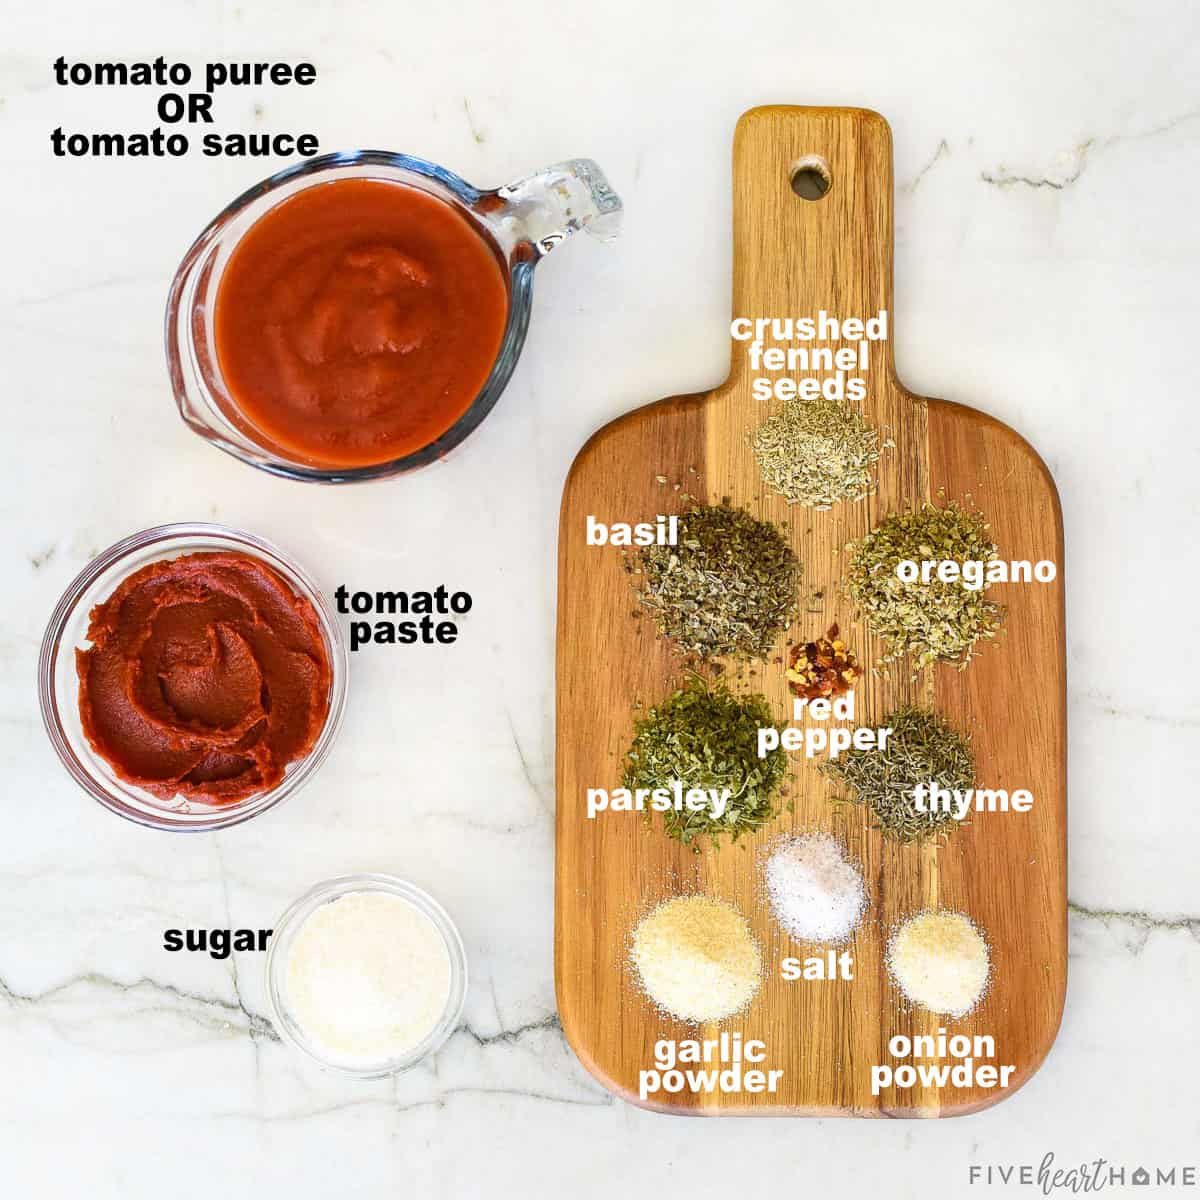 Aerial view of labeled ingredients.